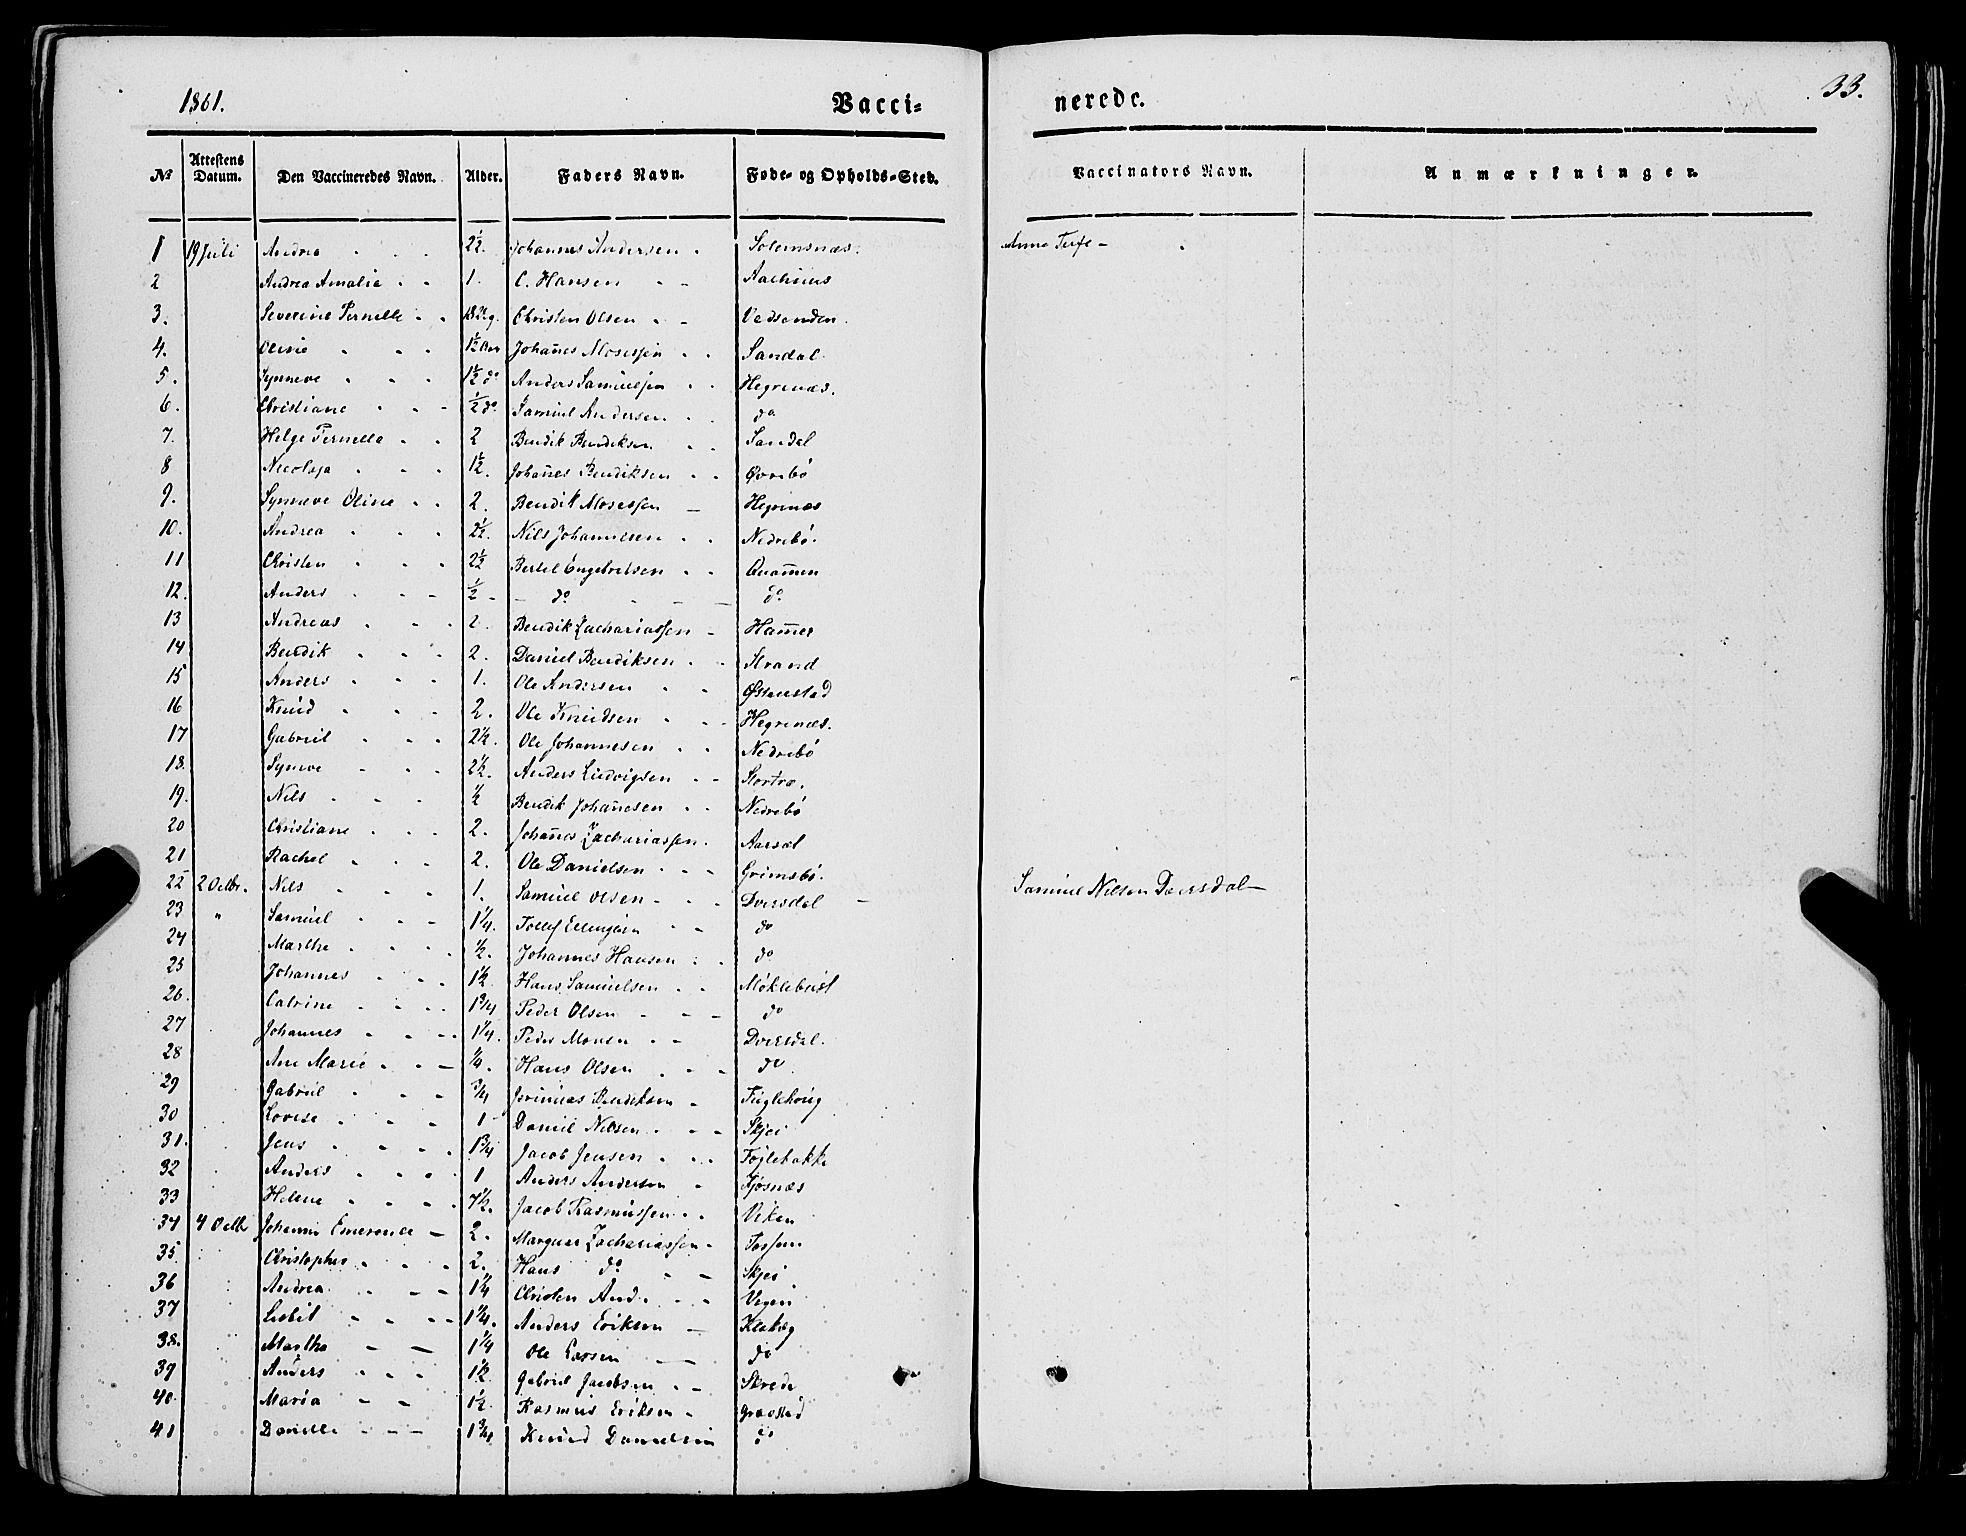 SAB, Jølster sokneprestembete, H/Haa/Haaa/L0010: Parish register (official) no. A 10, 1847-1865, p. 33